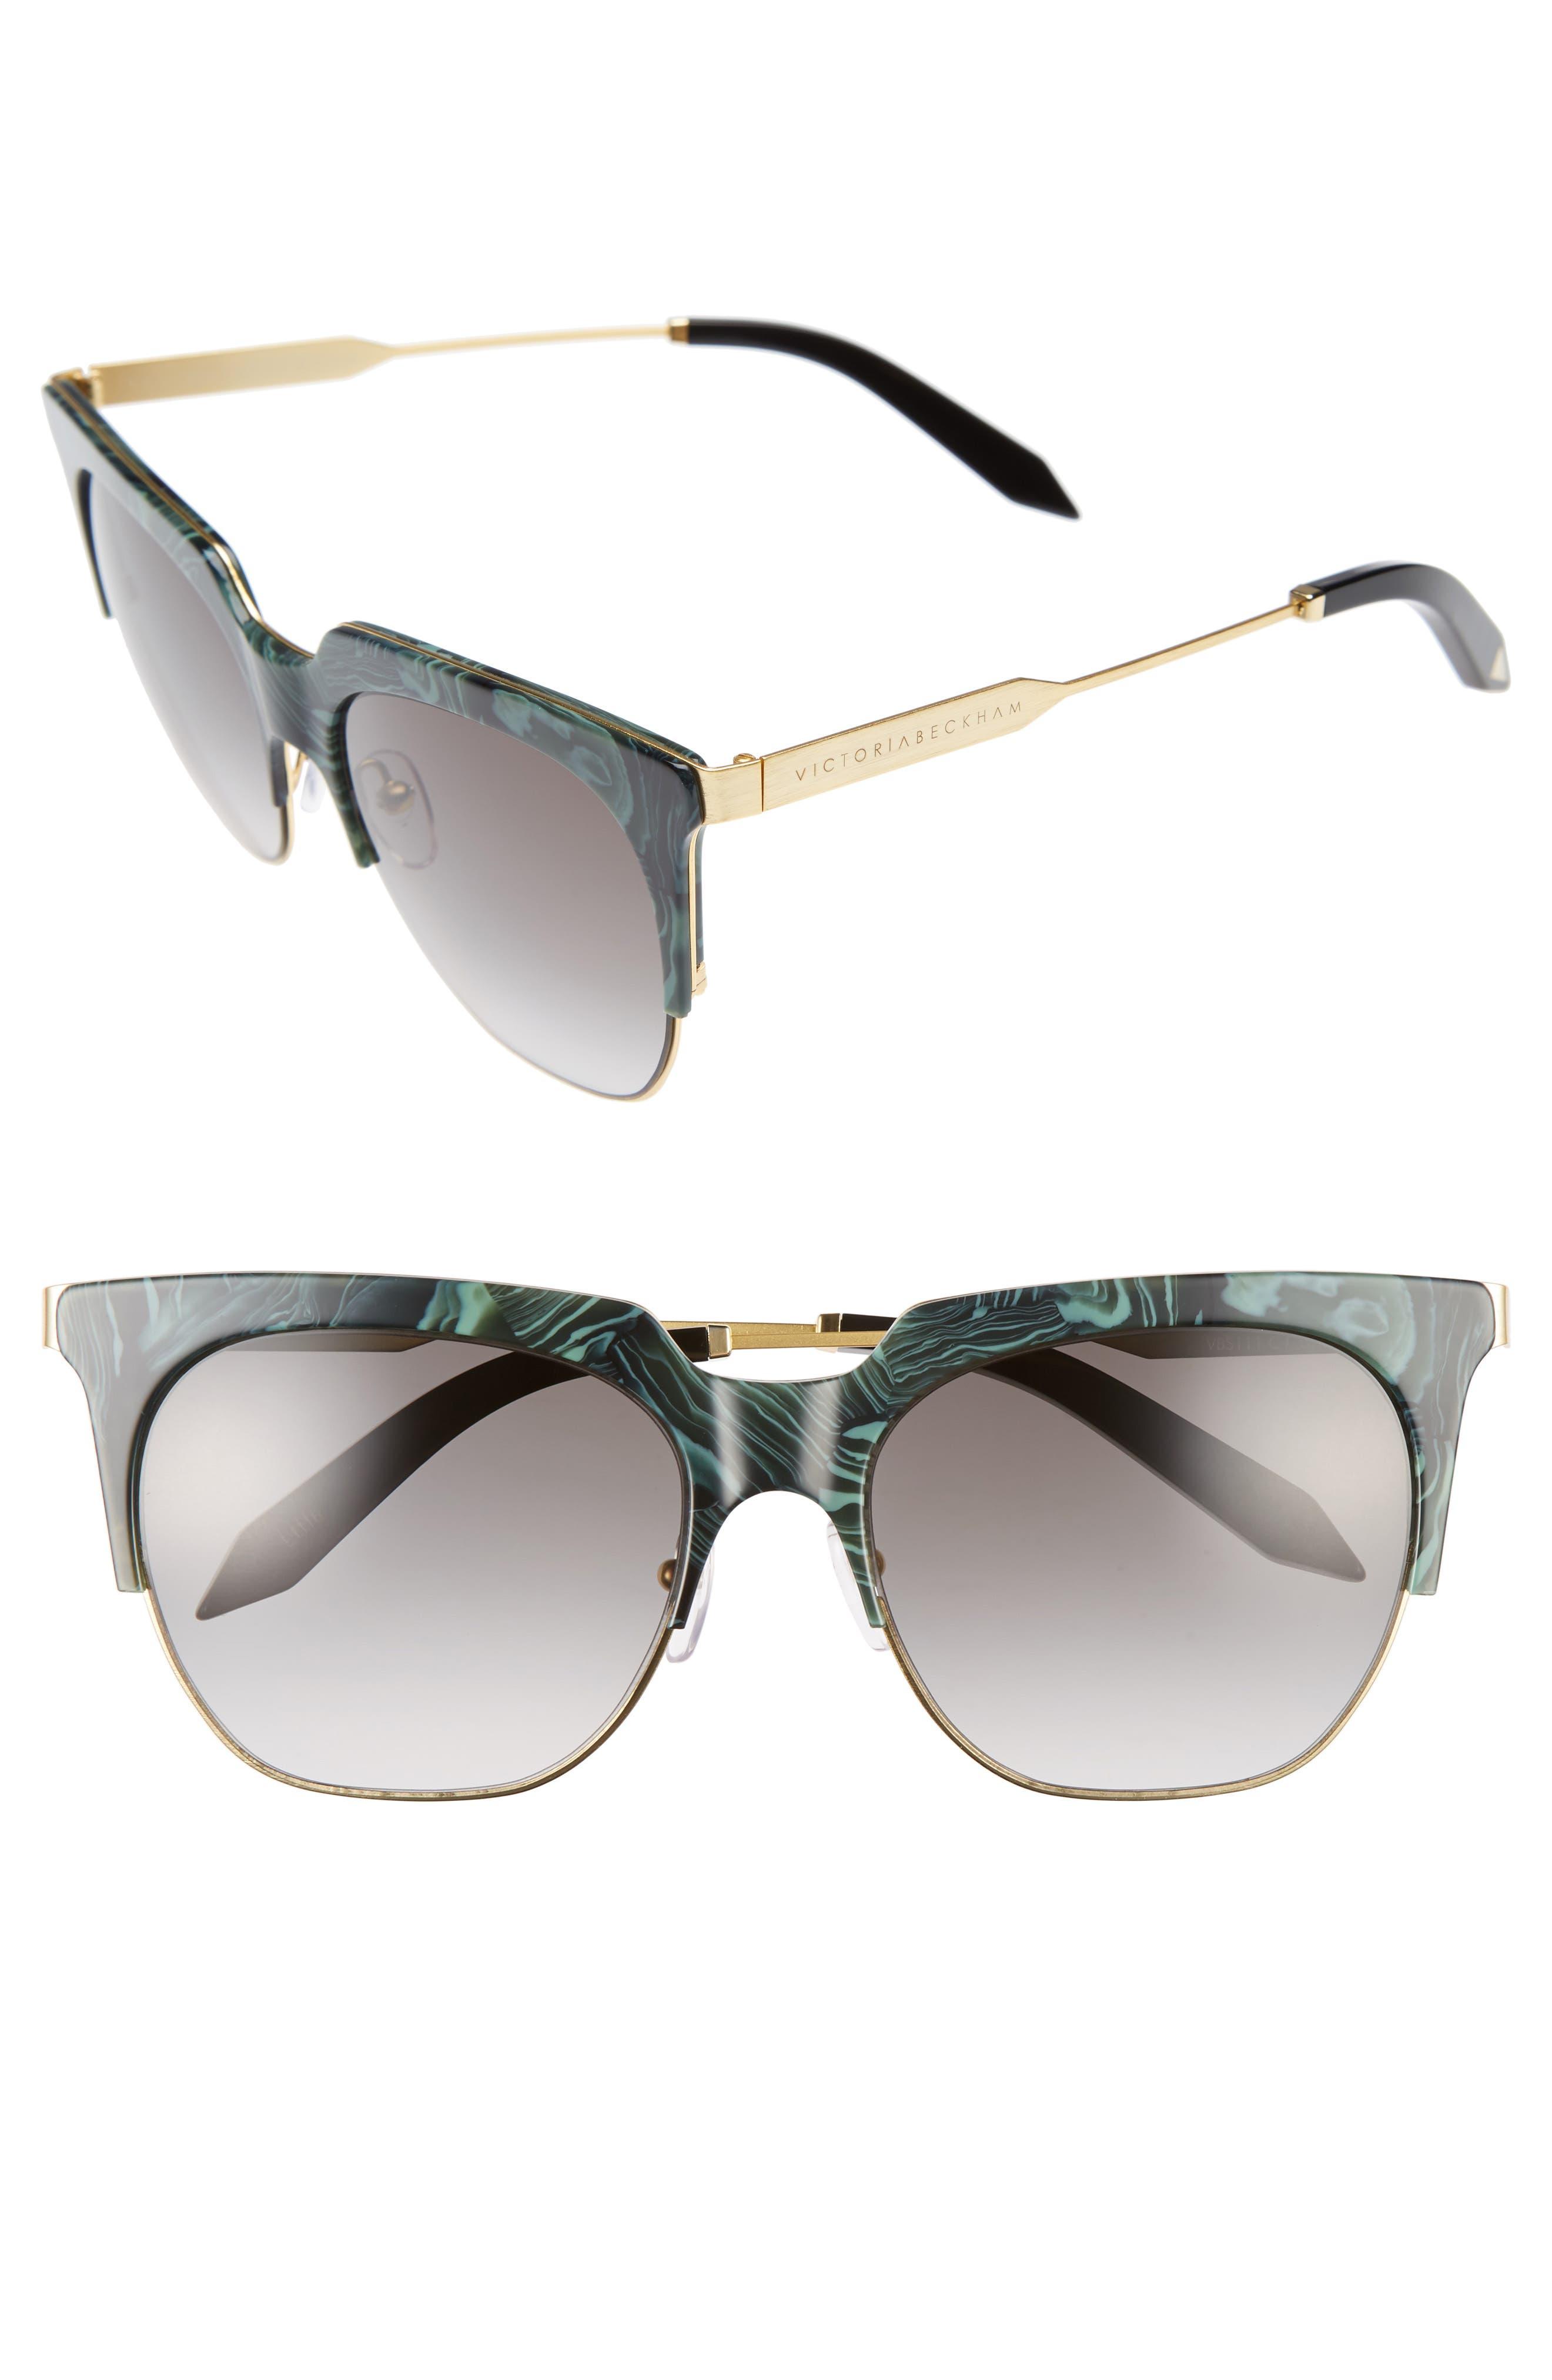 Victoria Beckham Layered Combination 57mm Square Sunglasses